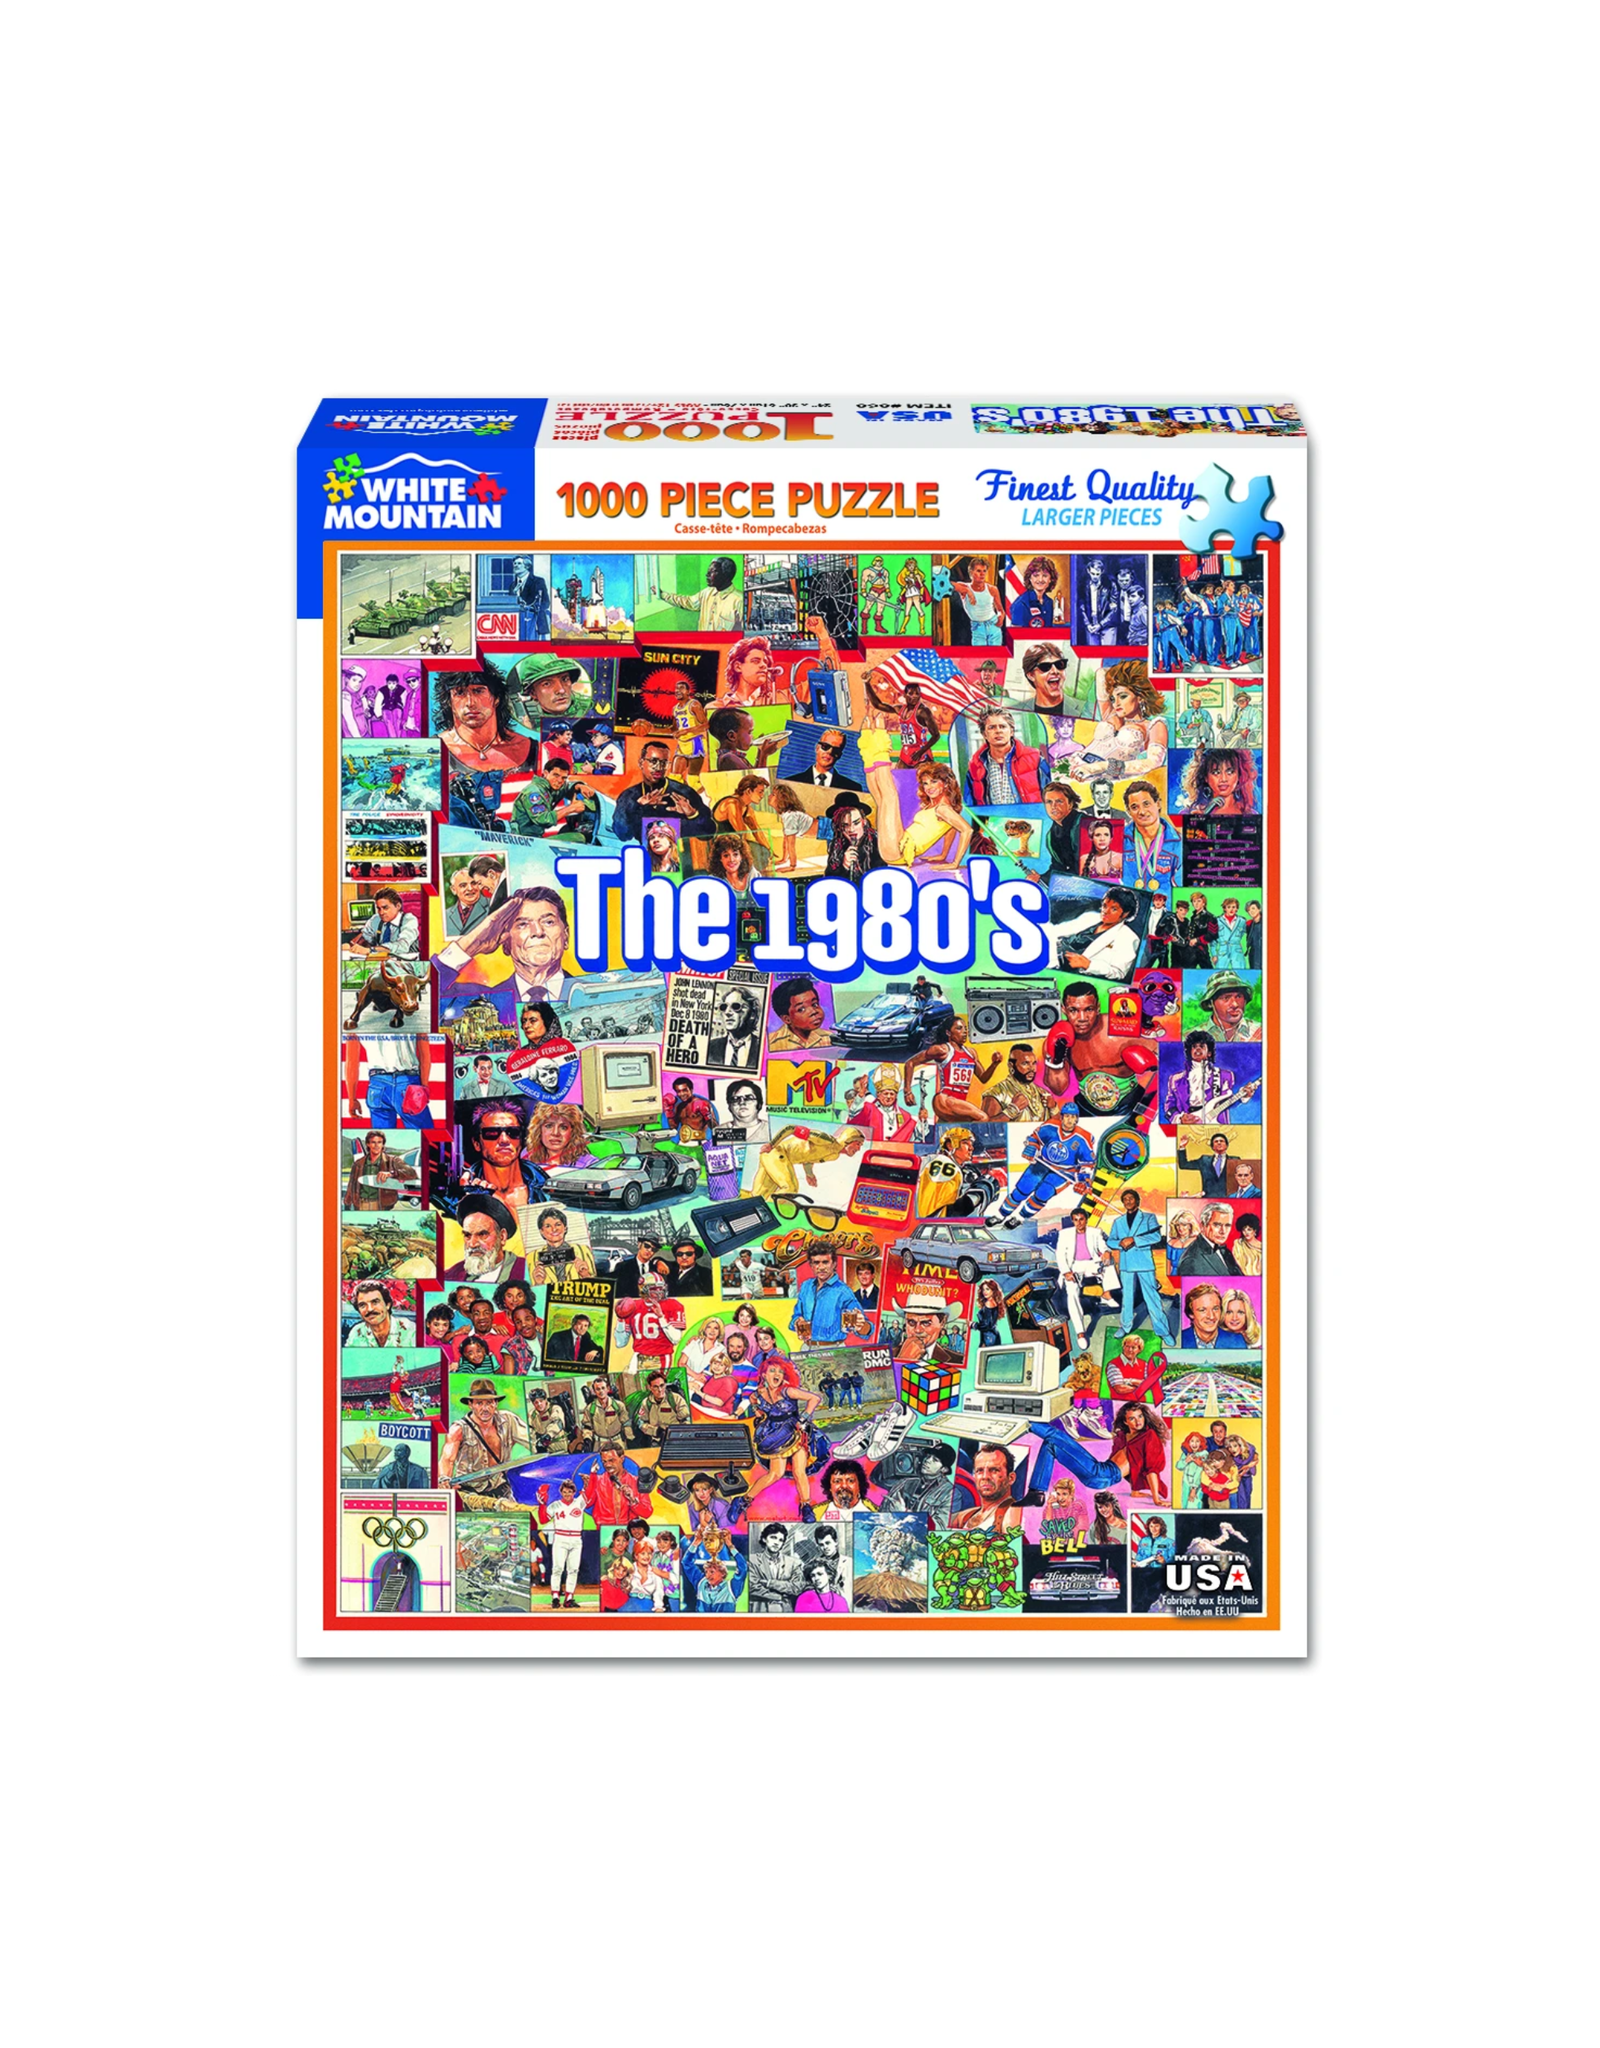 The 1980s 1000 Piece Puzzle